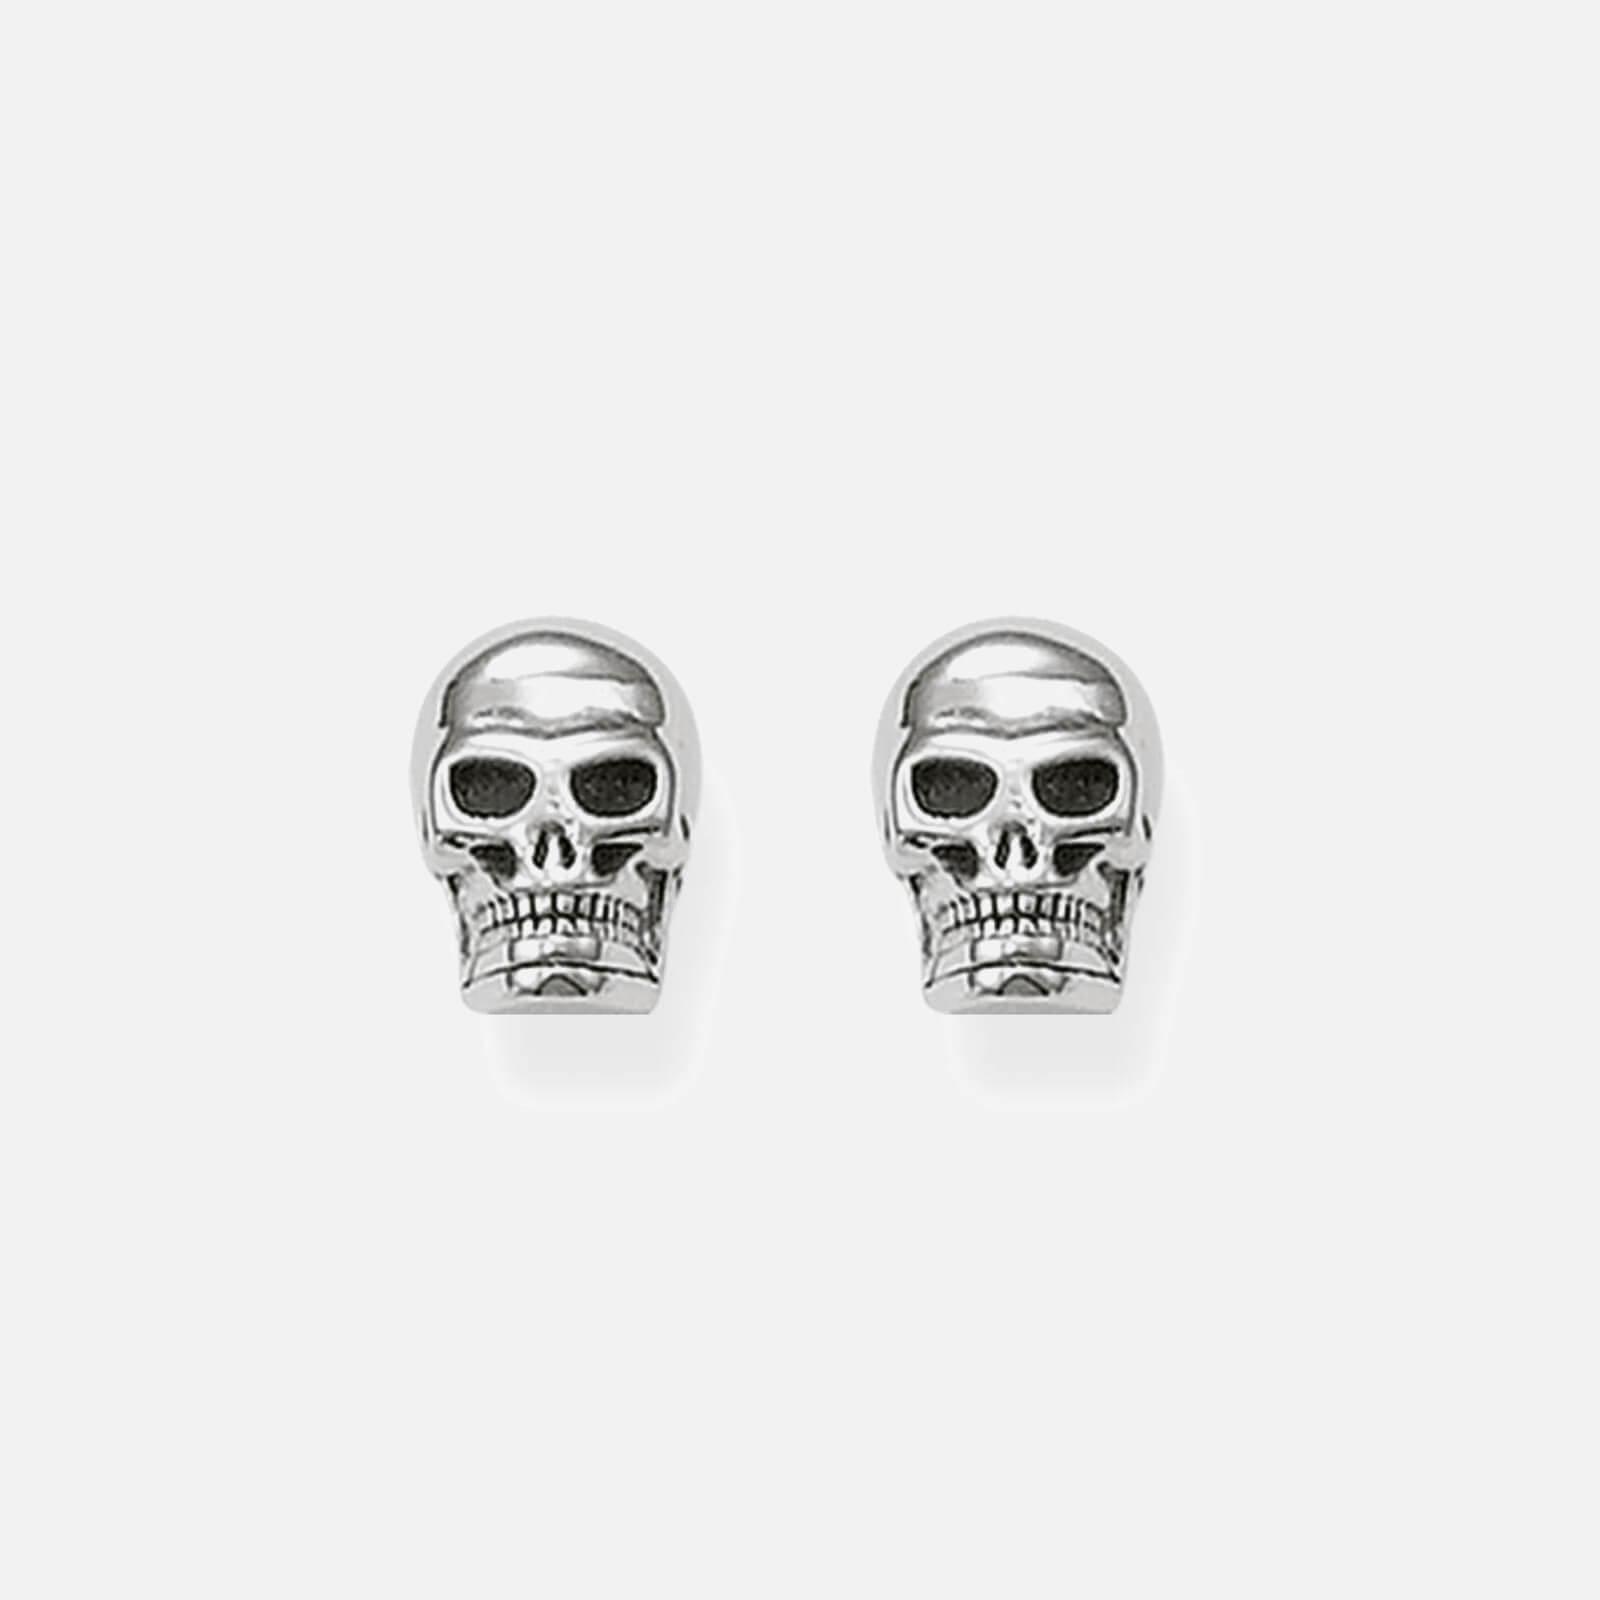 Thomas Sabo Women's Ear Studs Skull - Plain